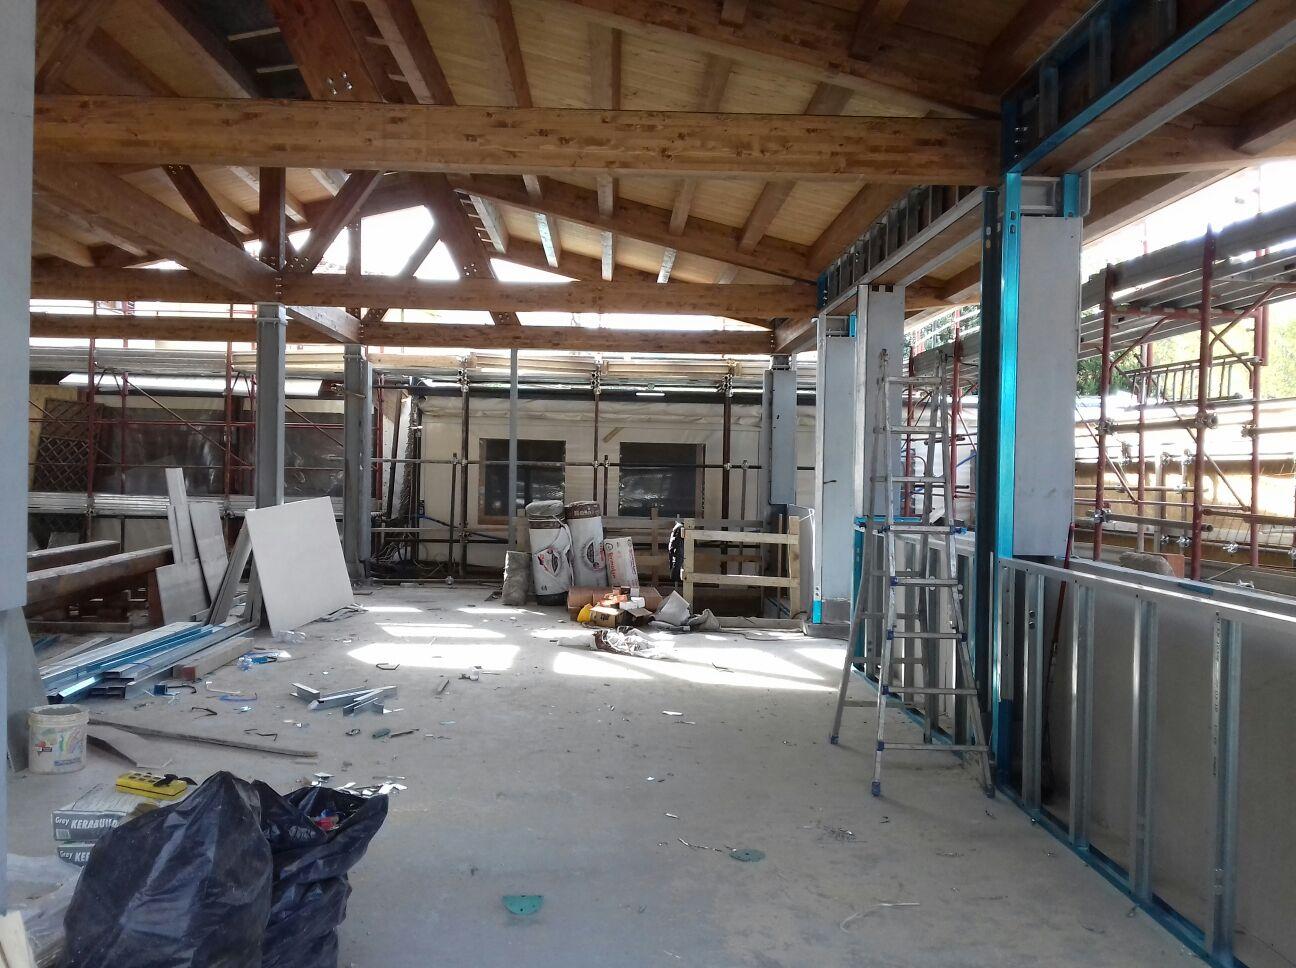 WORKS AT ACQUACHETA RESTAURANT, FLORENCE - Travelli Srl